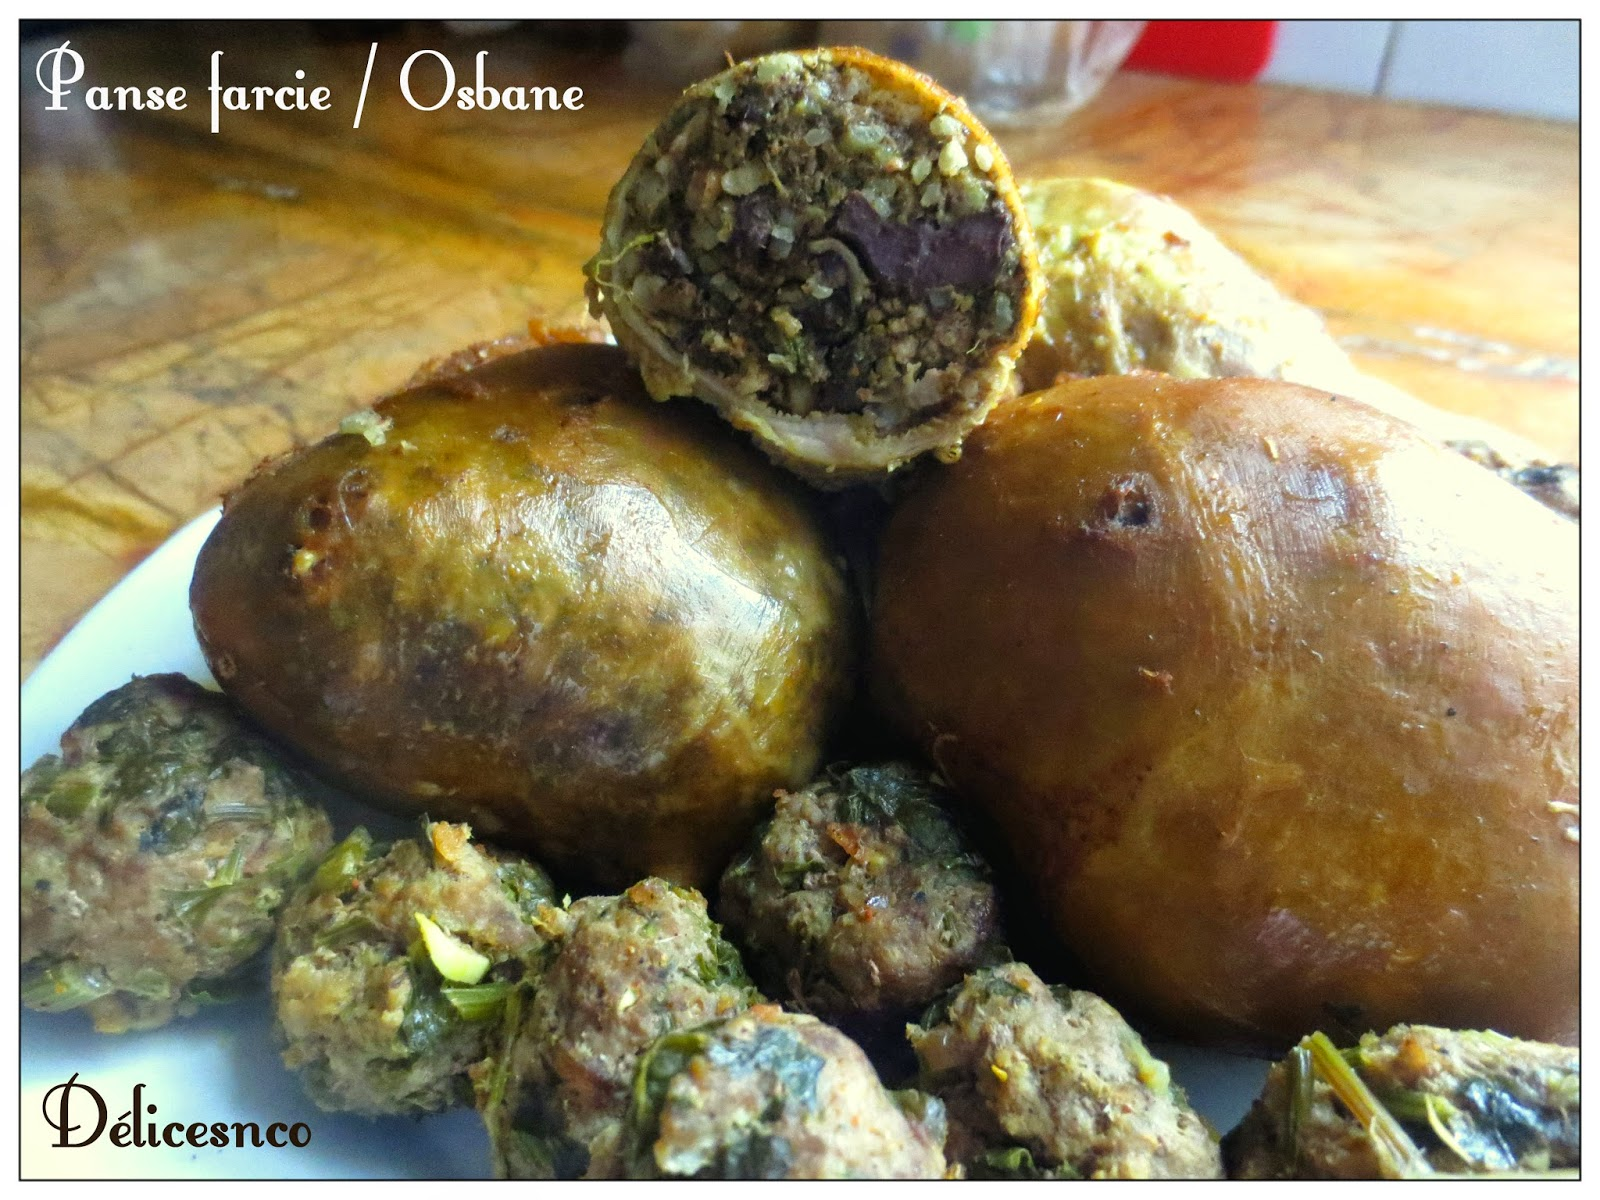 D lices and co osbane bakbouka douara panse farcie for Aide de cuisine